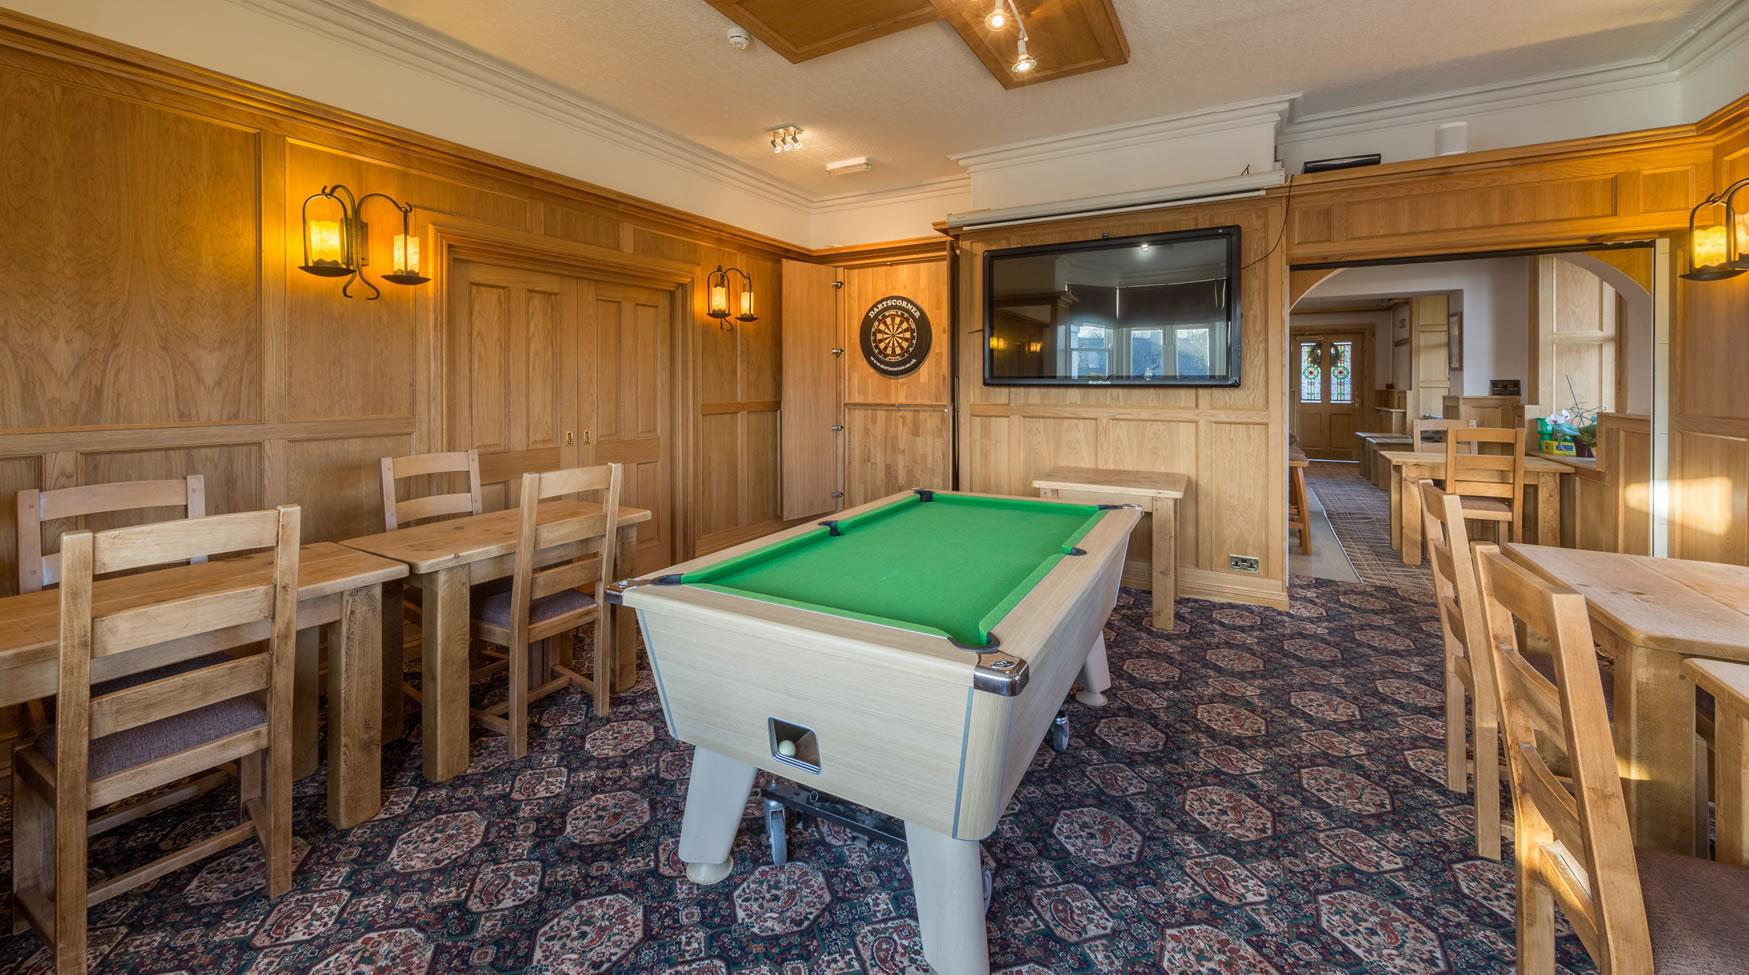 pool-table-darts